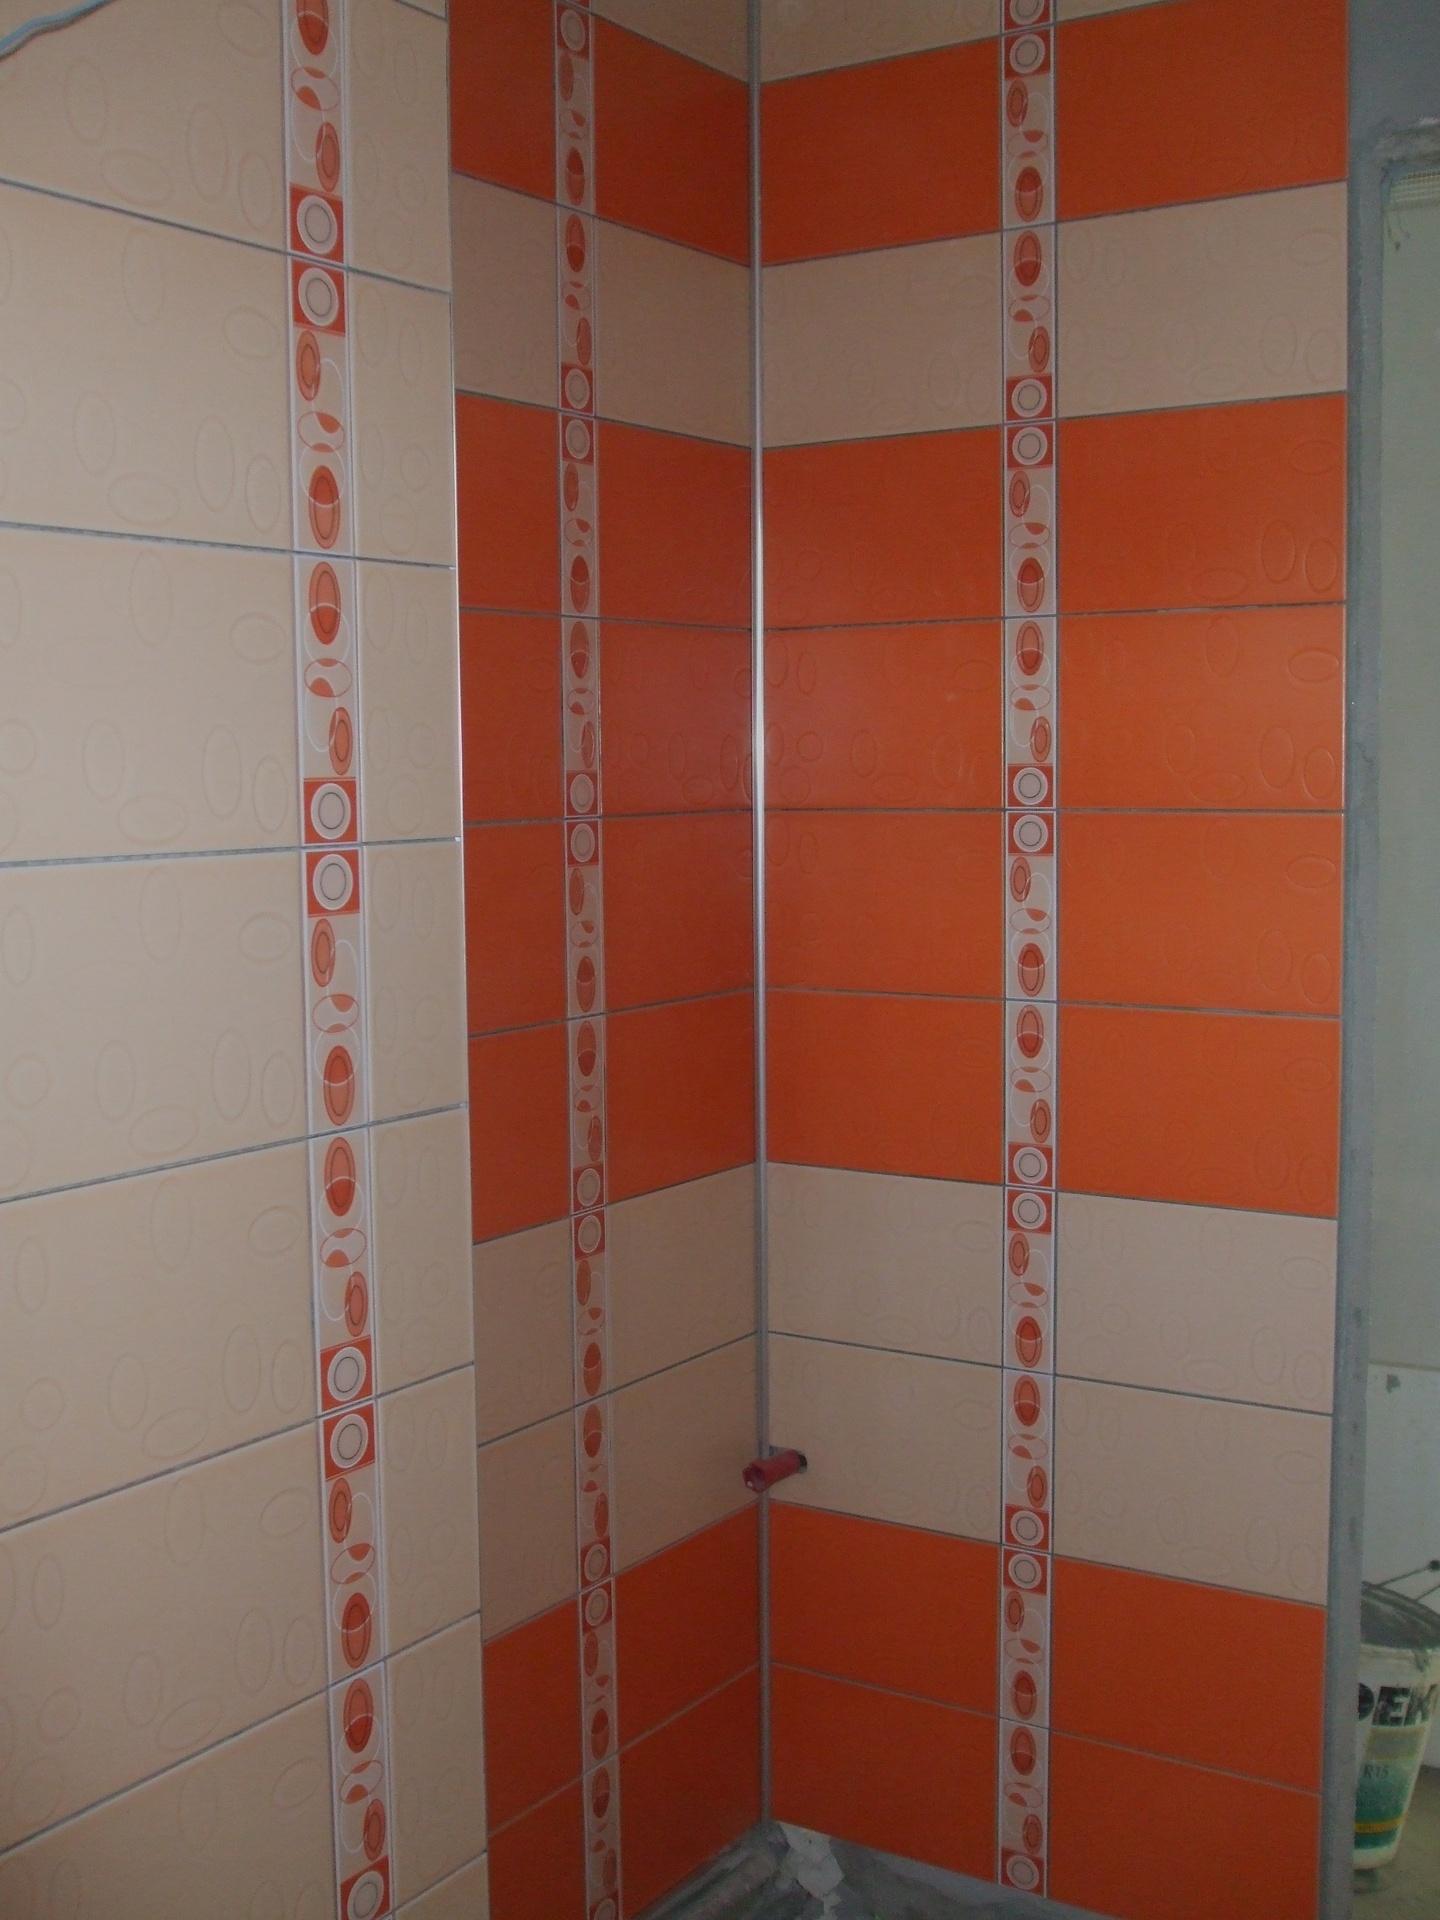 faianta portocalie si crem delimitate de brau faianta,design placare faianta fasii orizontale si verticale